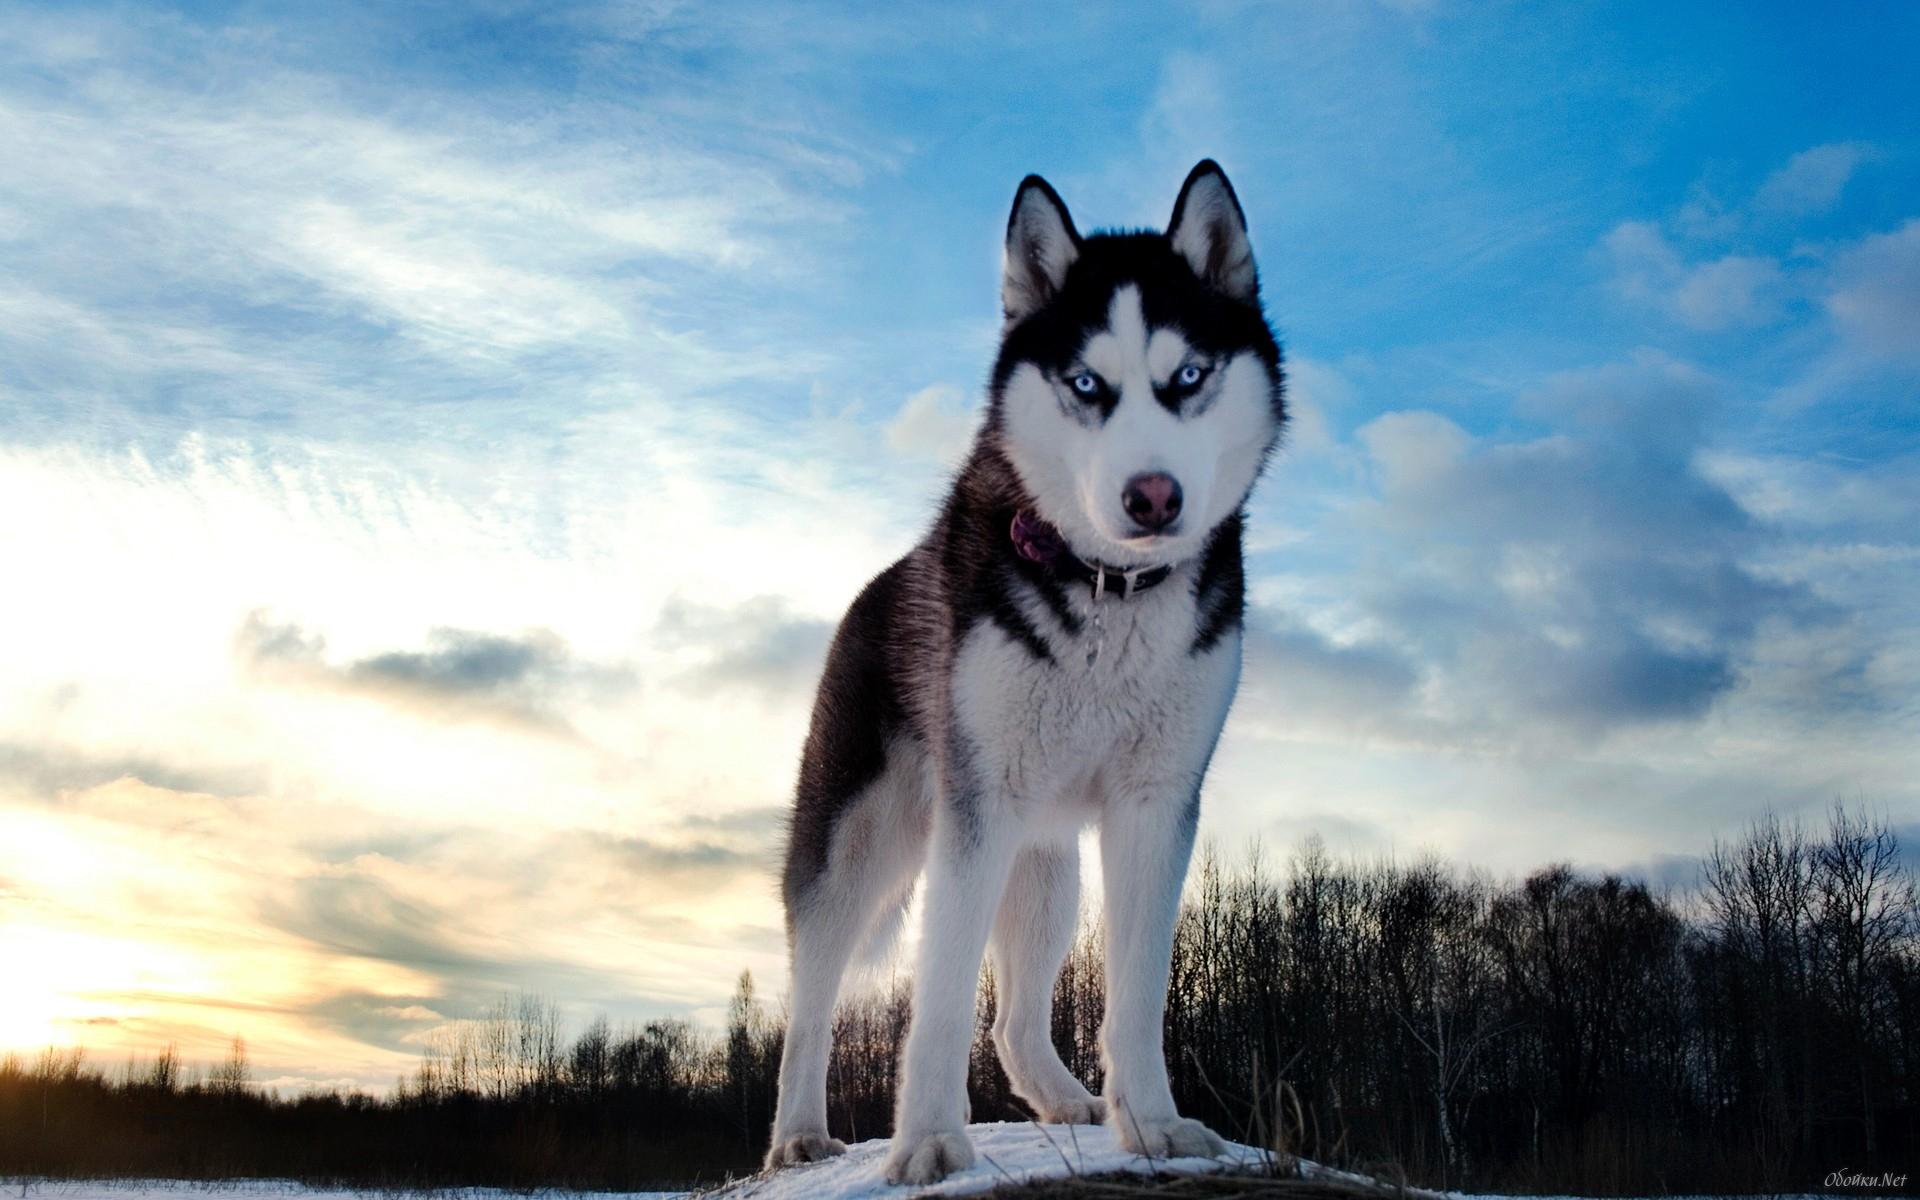 Husky Dog Winter HD Wallpaper ImageBankbiz 1920x1200